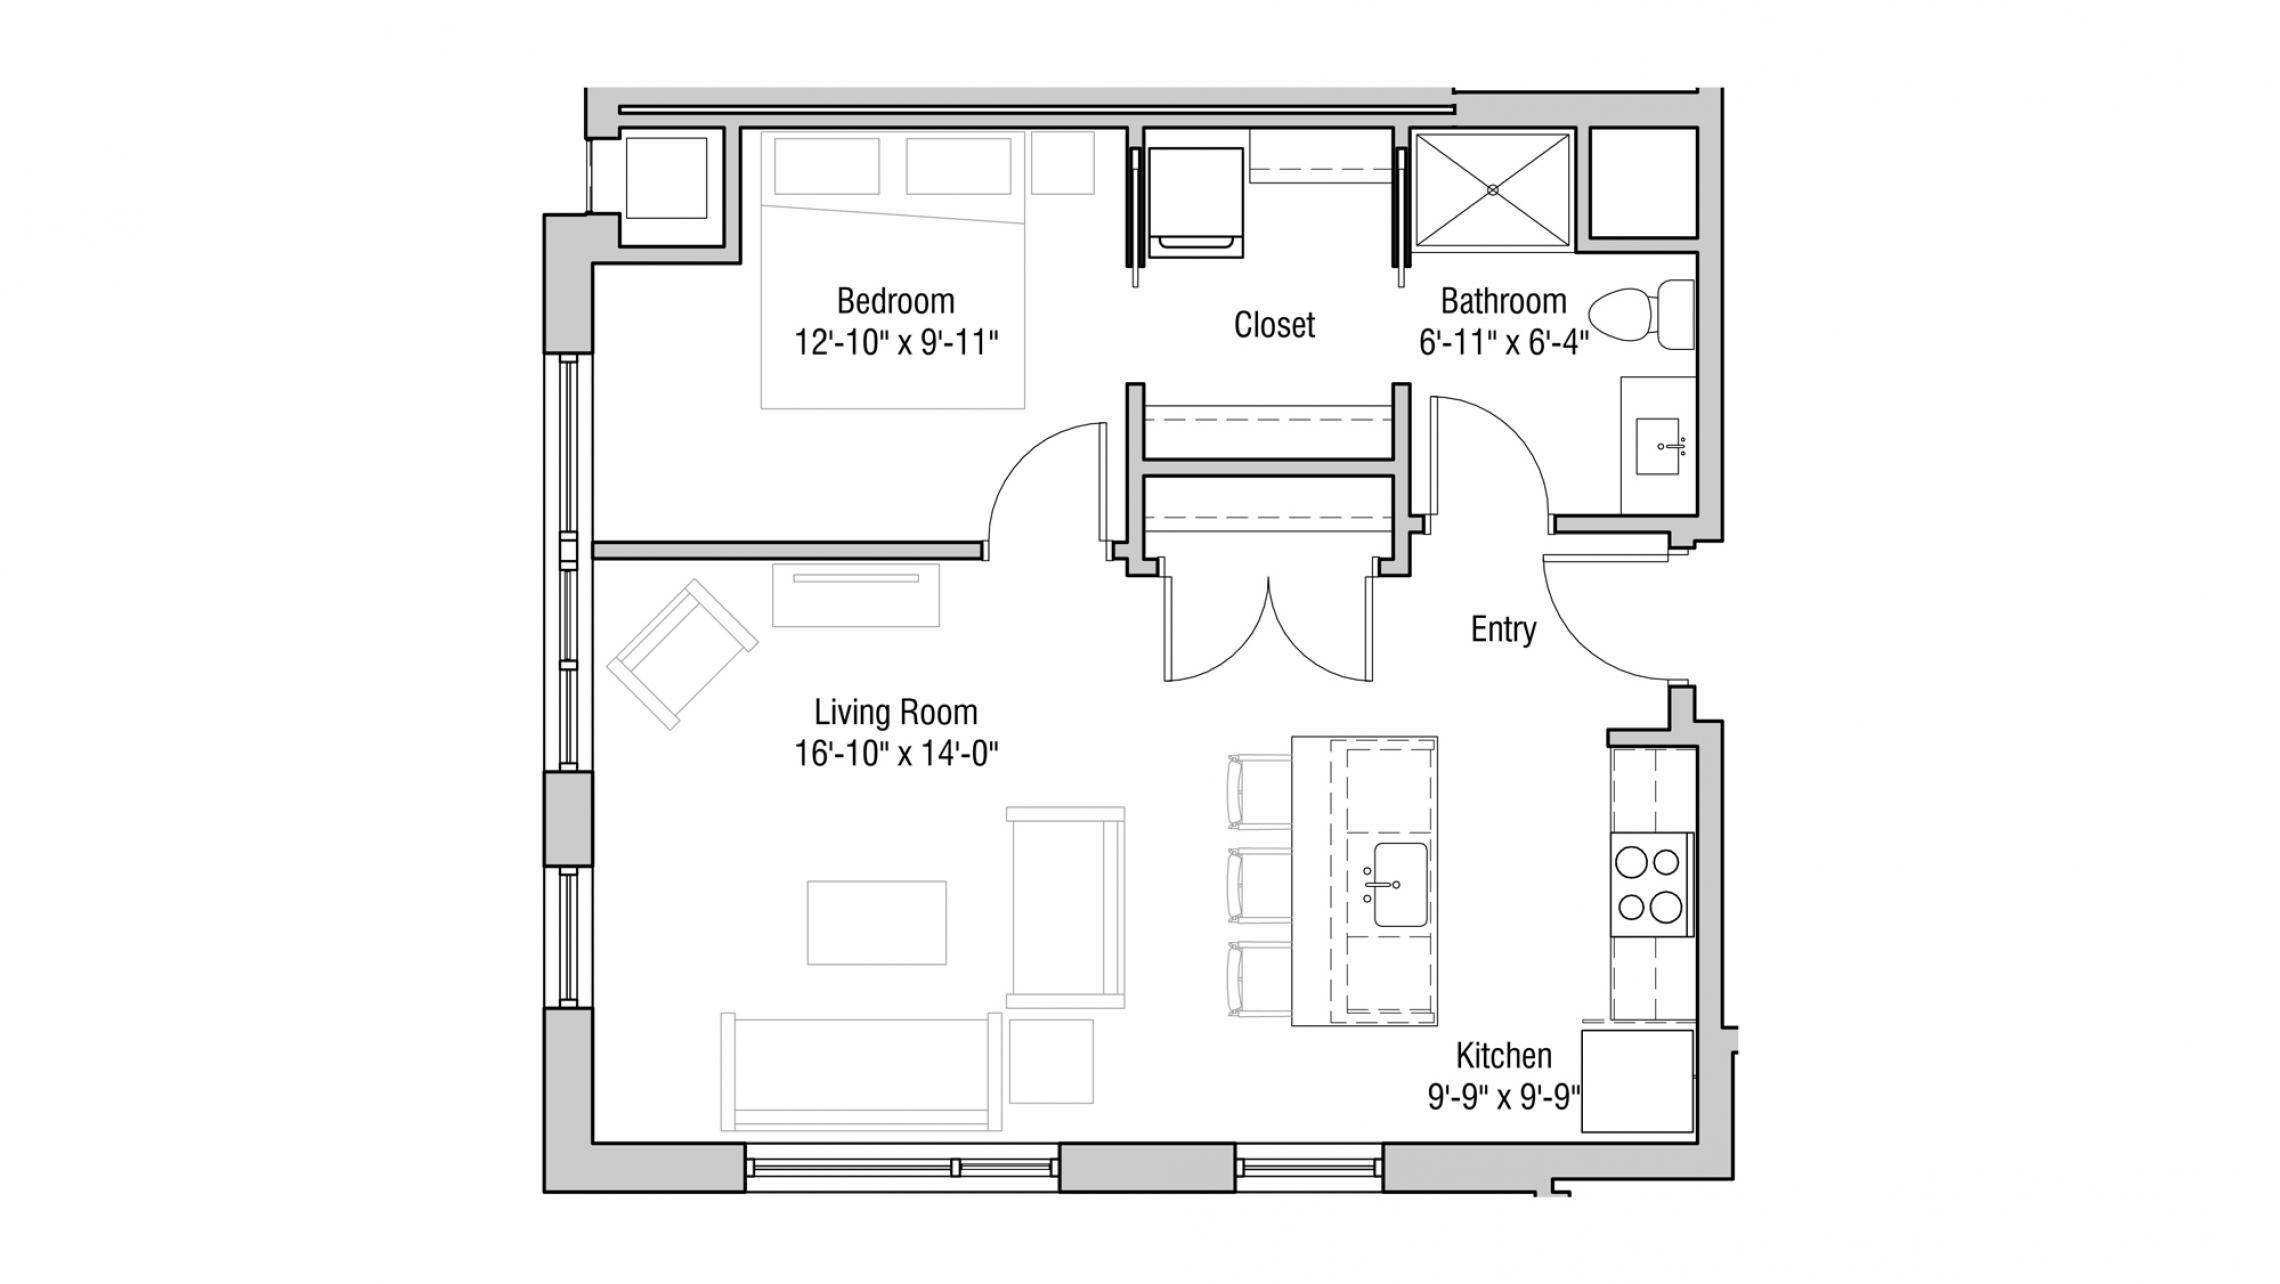 ULI Quarter Row 302 - One Bedroom, One Bathroom